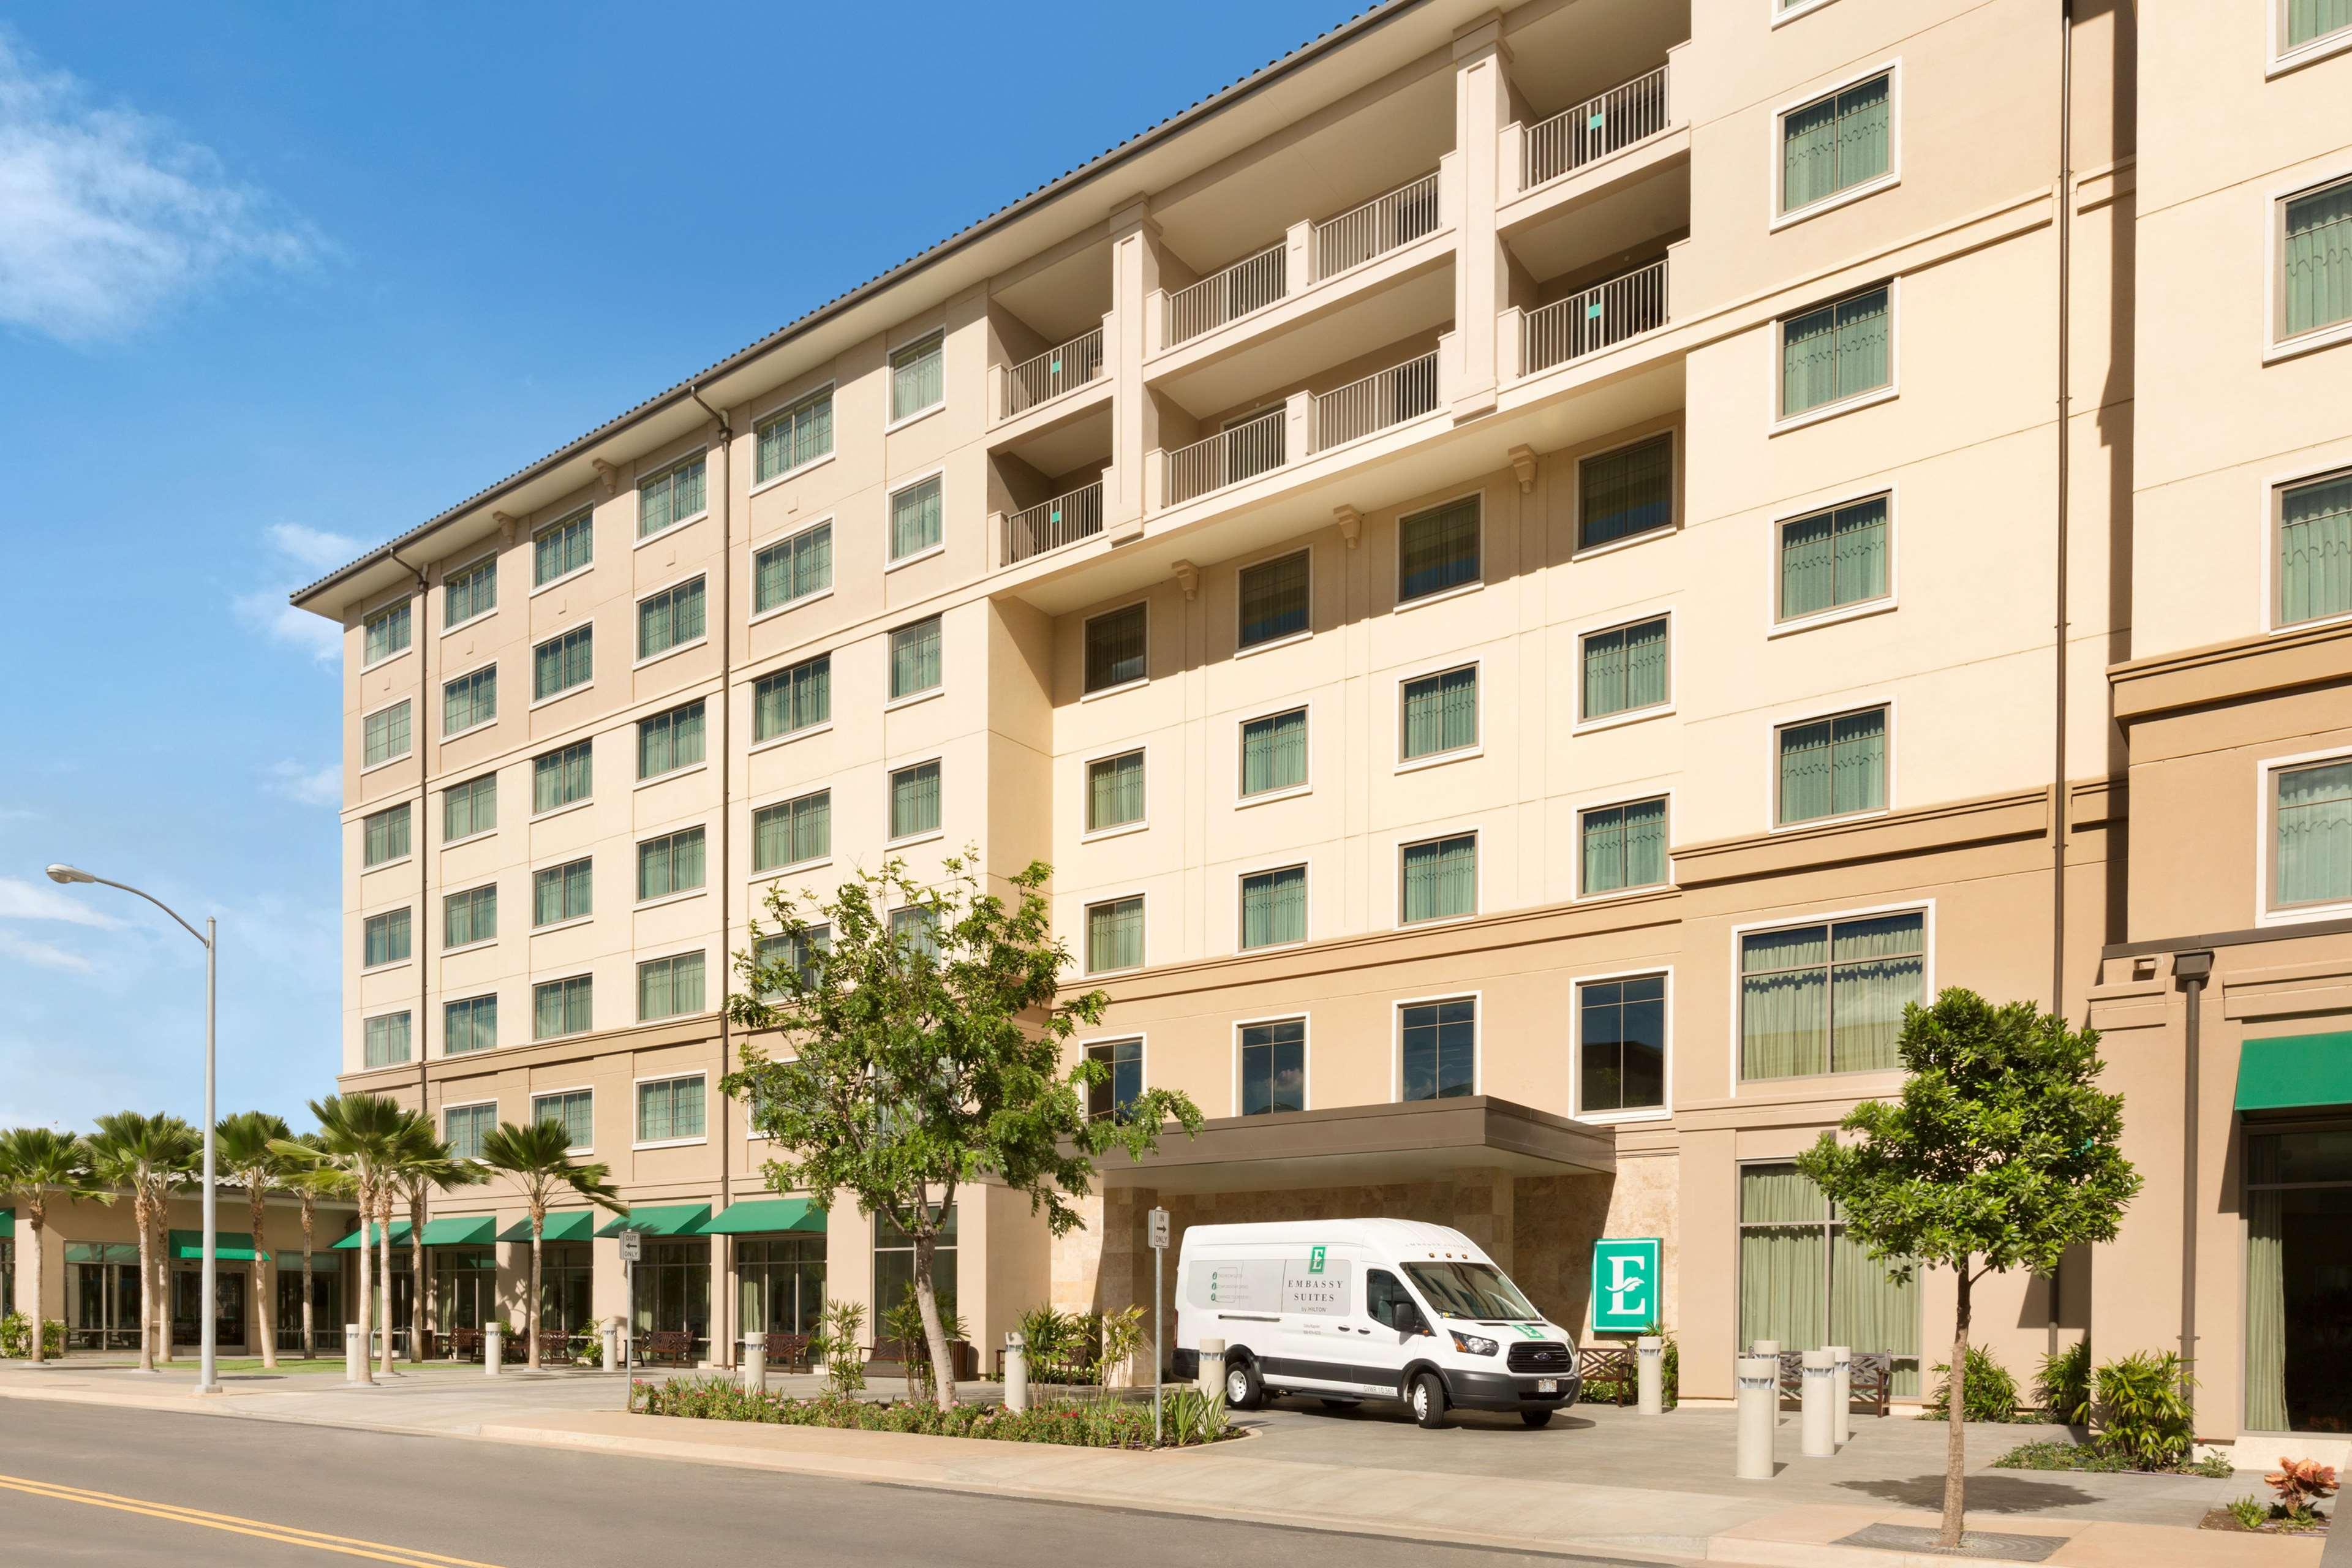 Embassy Suites by Hilton Oahu Kapolei image 4